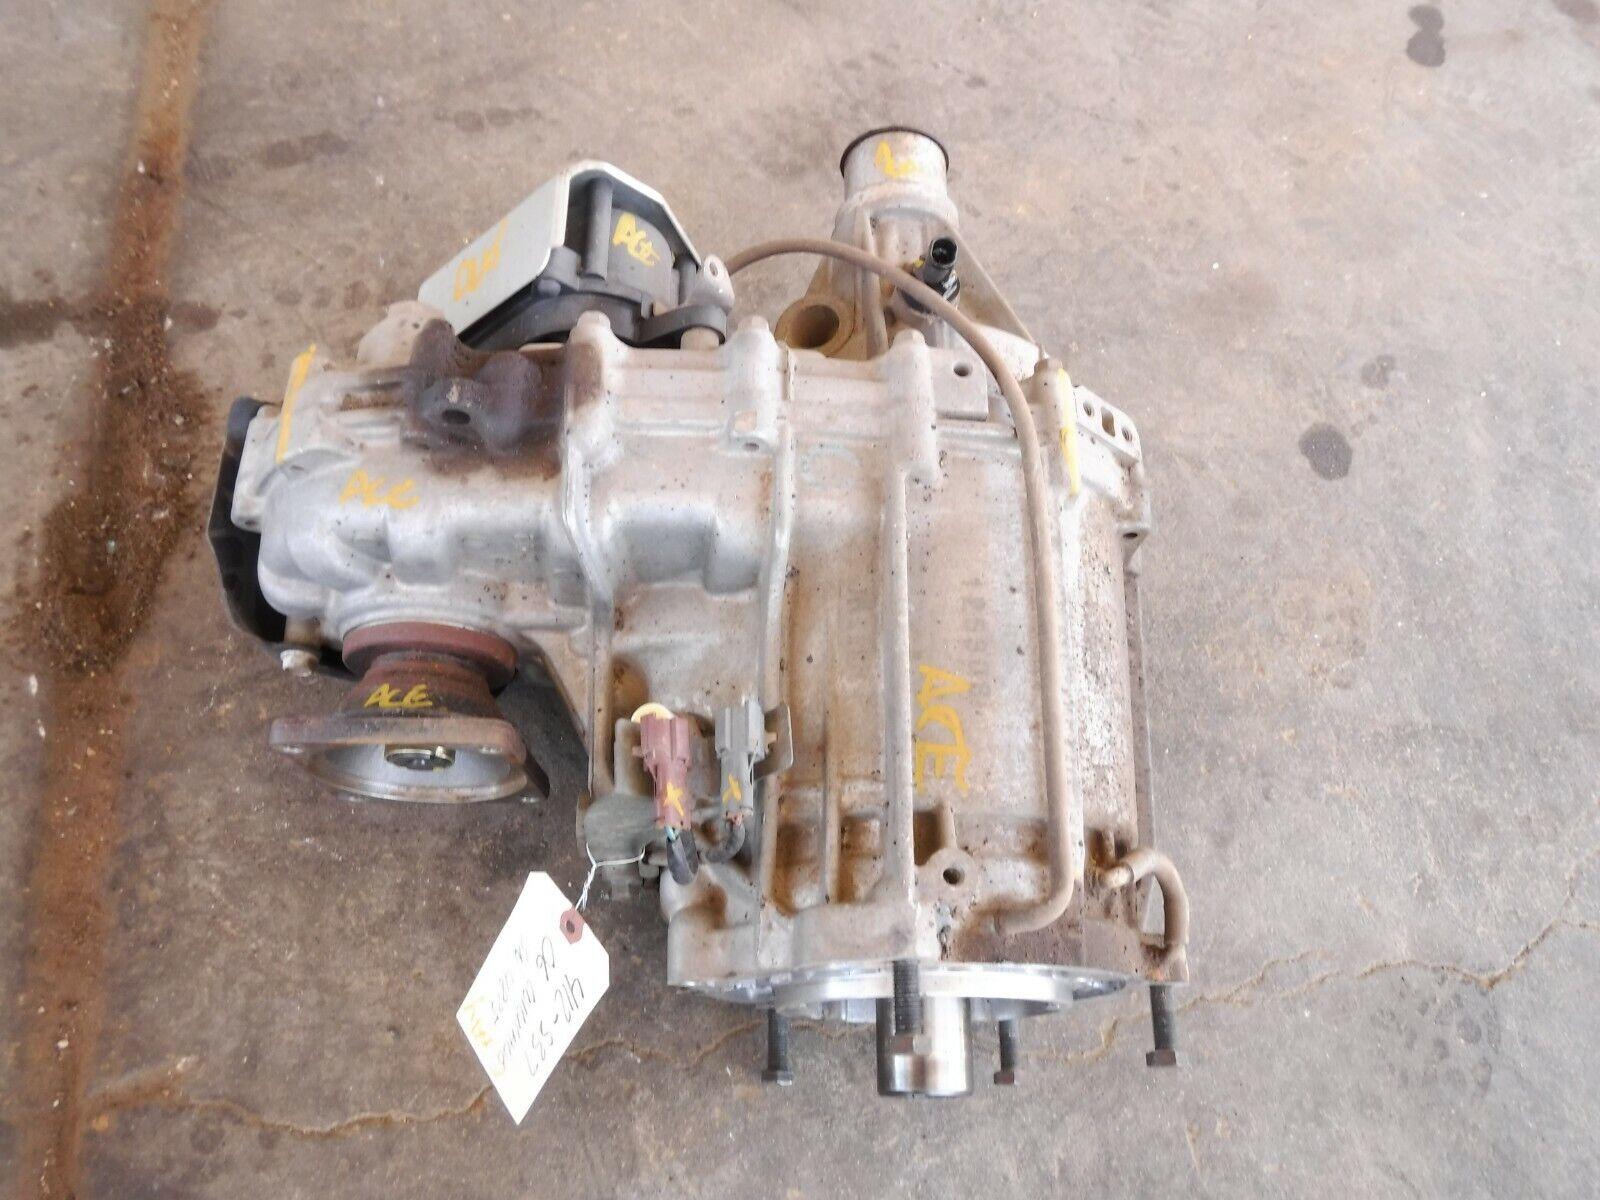 Used Isuzu i-350 Transmission & Drivetrain for Sale